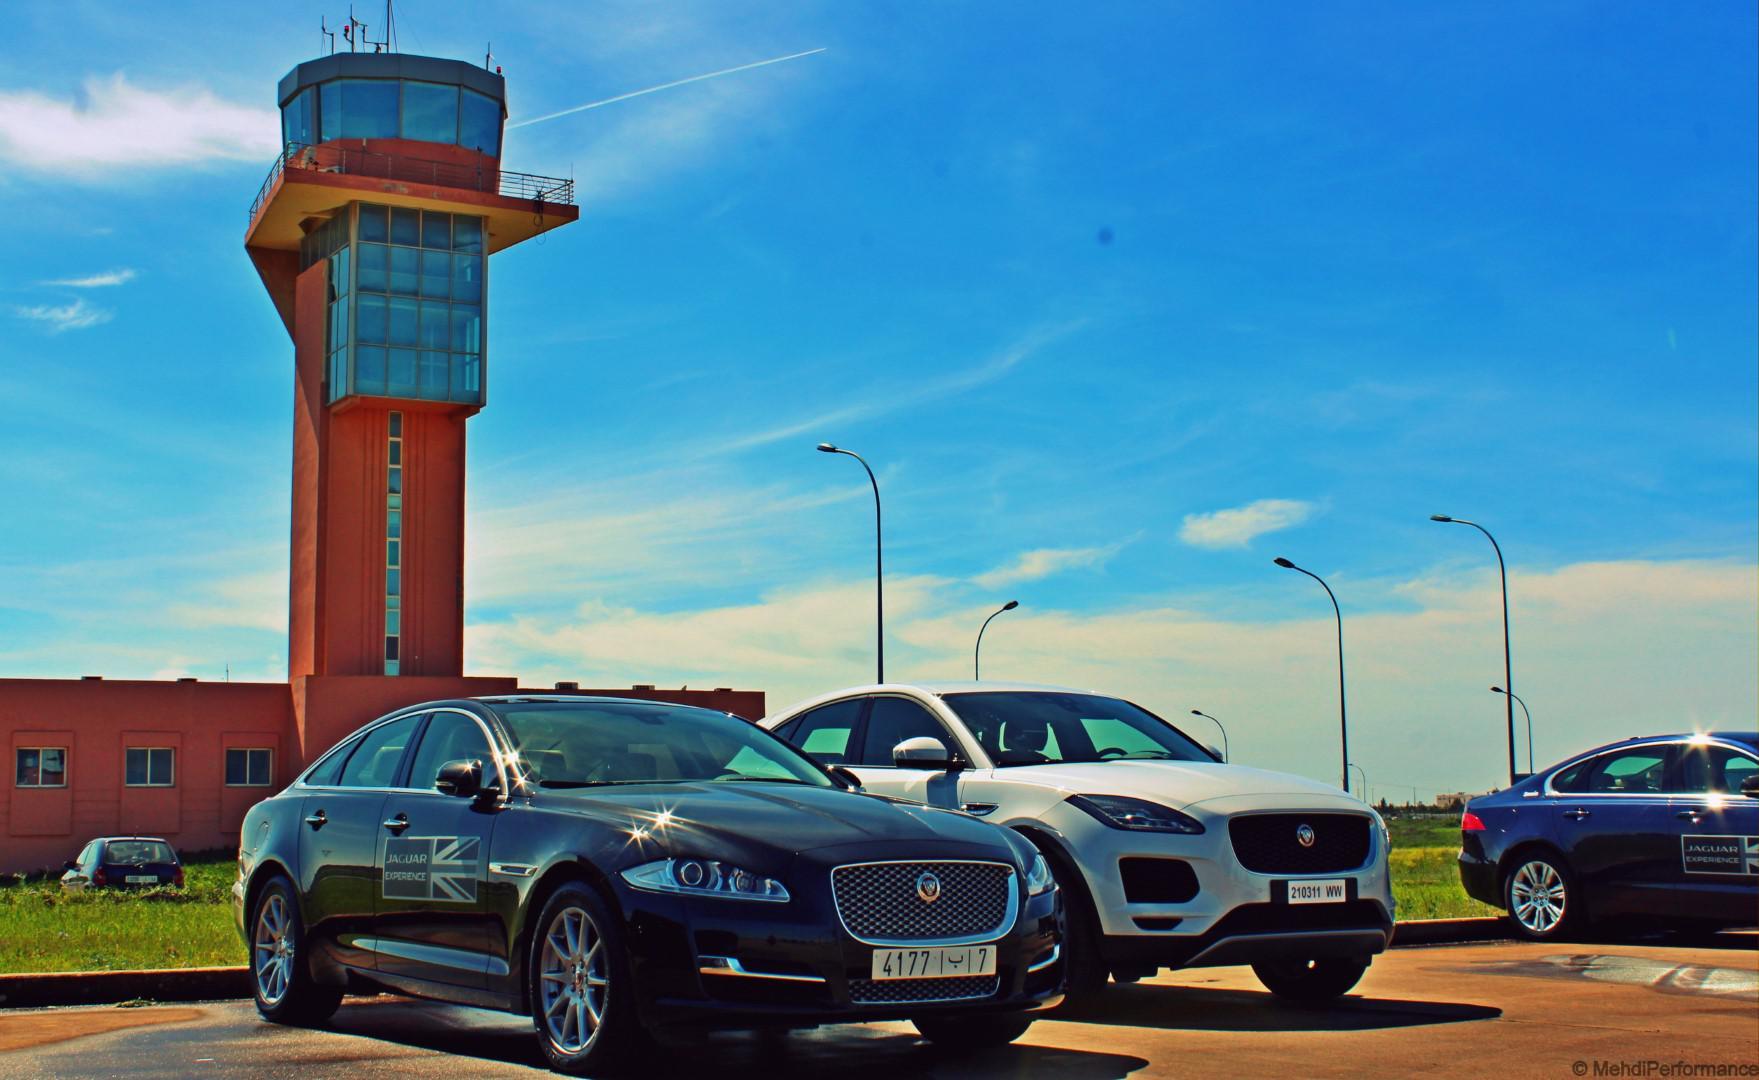 jaguar-amp-land-rover-experience-734-1.jpg